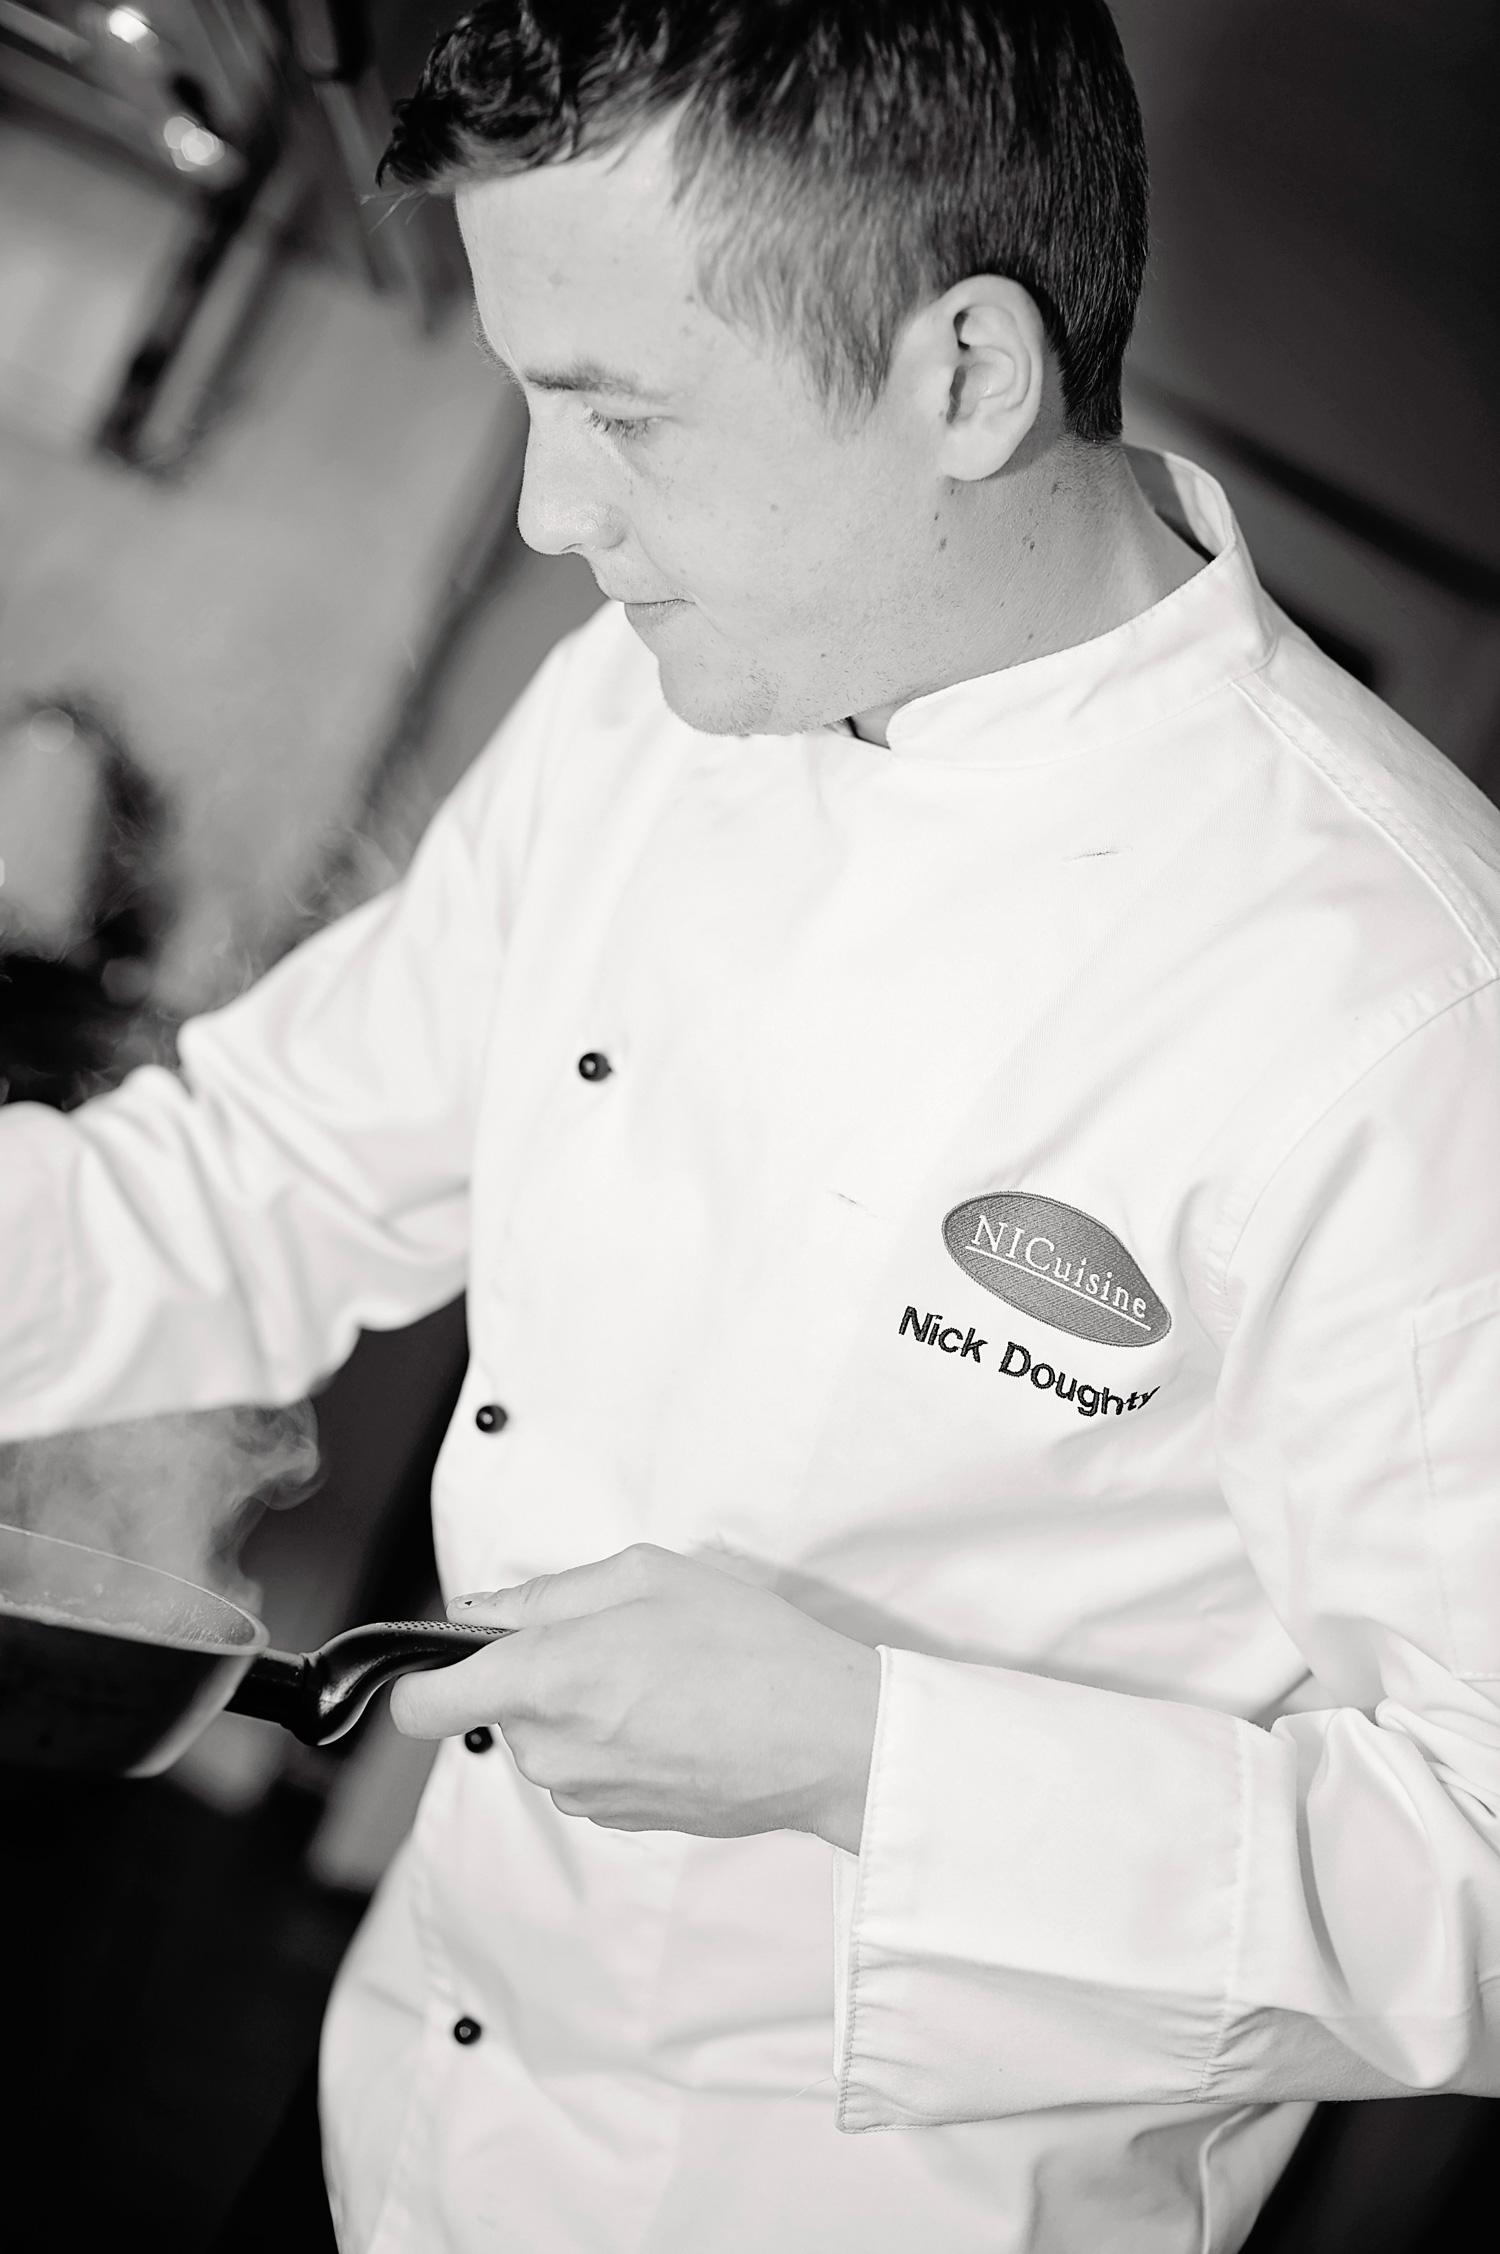 Nick Doughty - Executive Chef / Proprietor